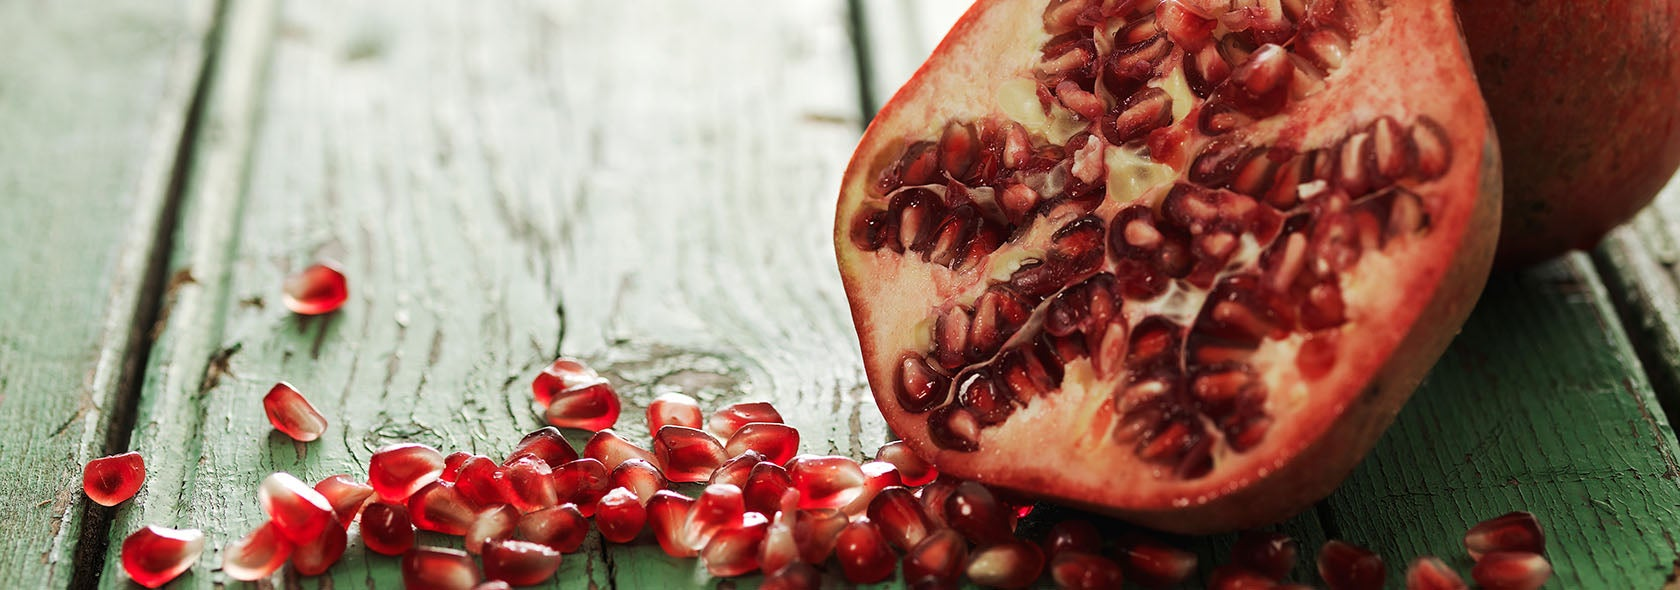 Ingredient_Pomegranate_hero